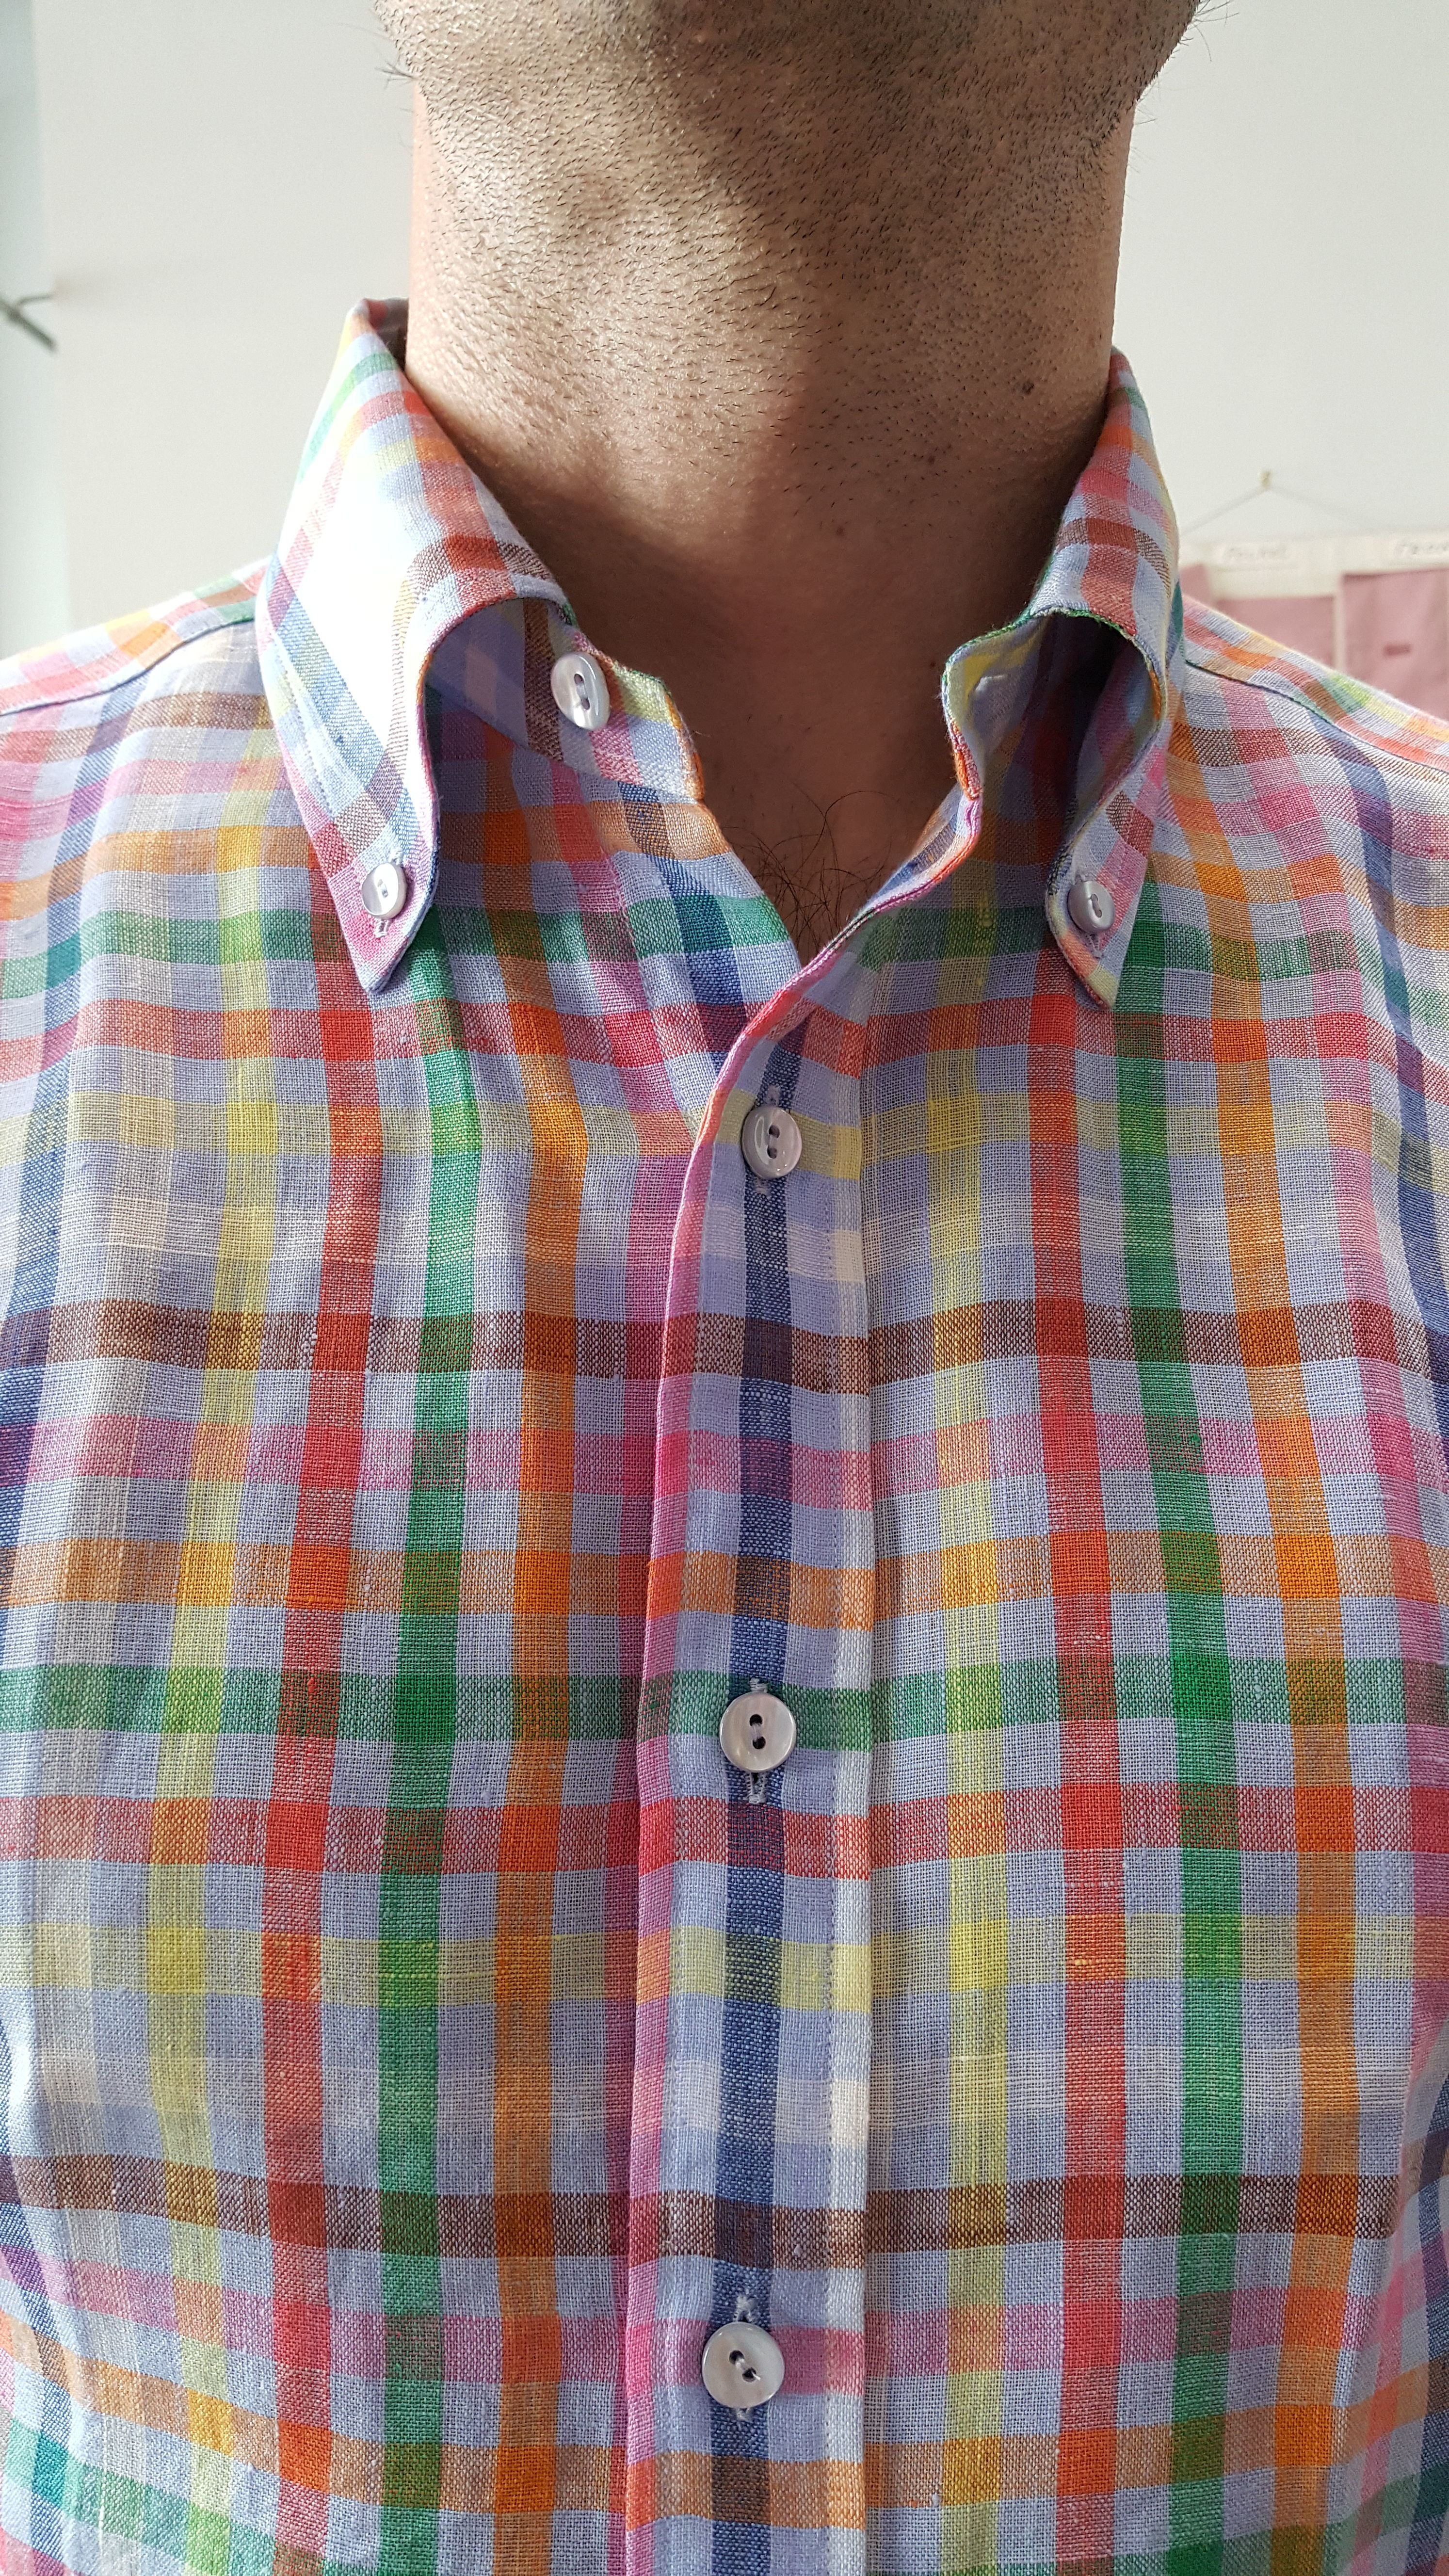 Shirtmaven's photos in The OCBD collar roll thread